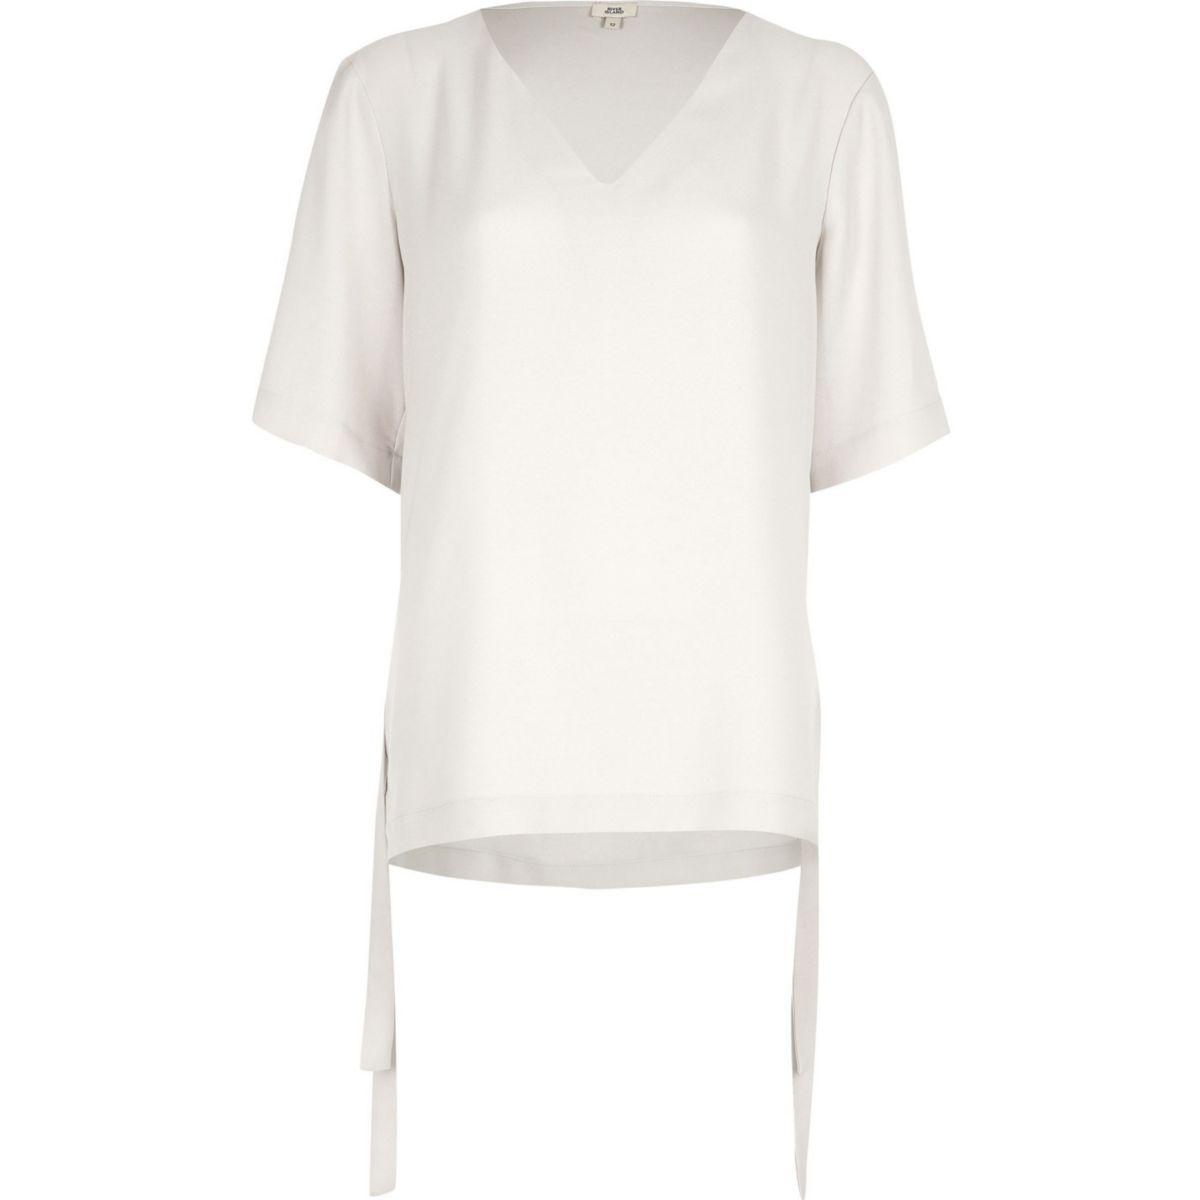 Light grey short sleeve tie side T-shirt